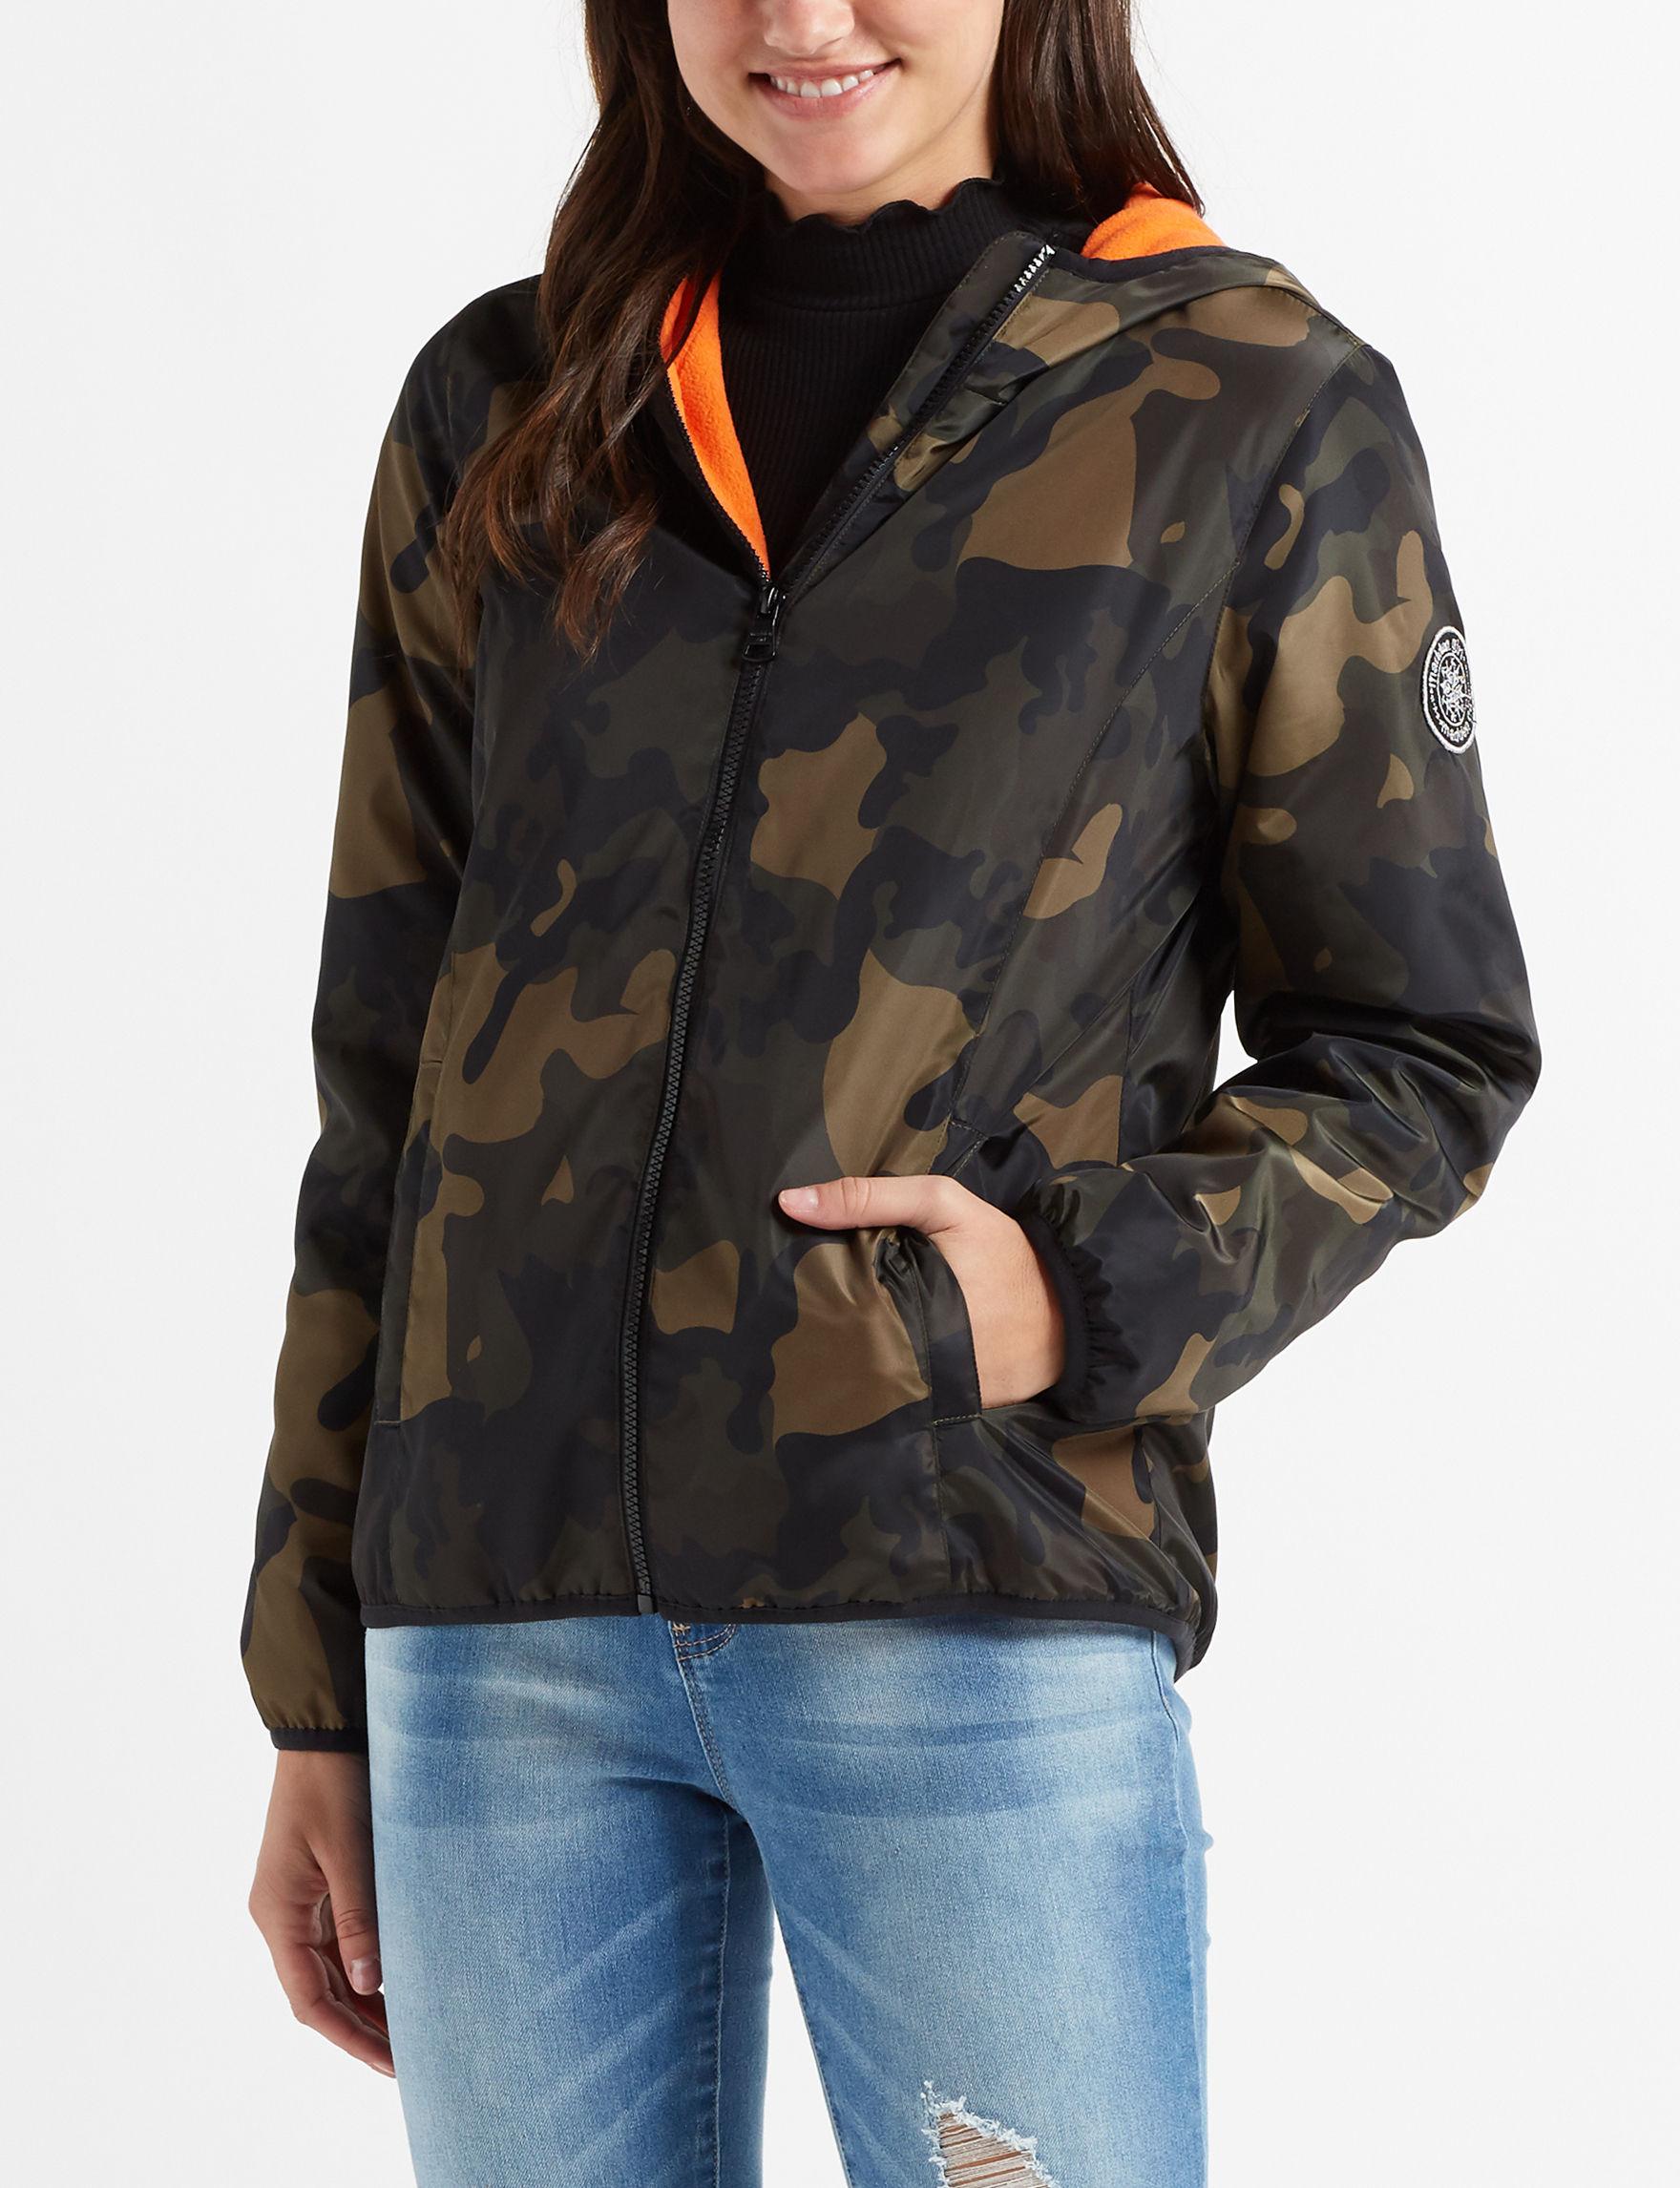 Madden Girl Camo Fleece & Soft Shell Jackets